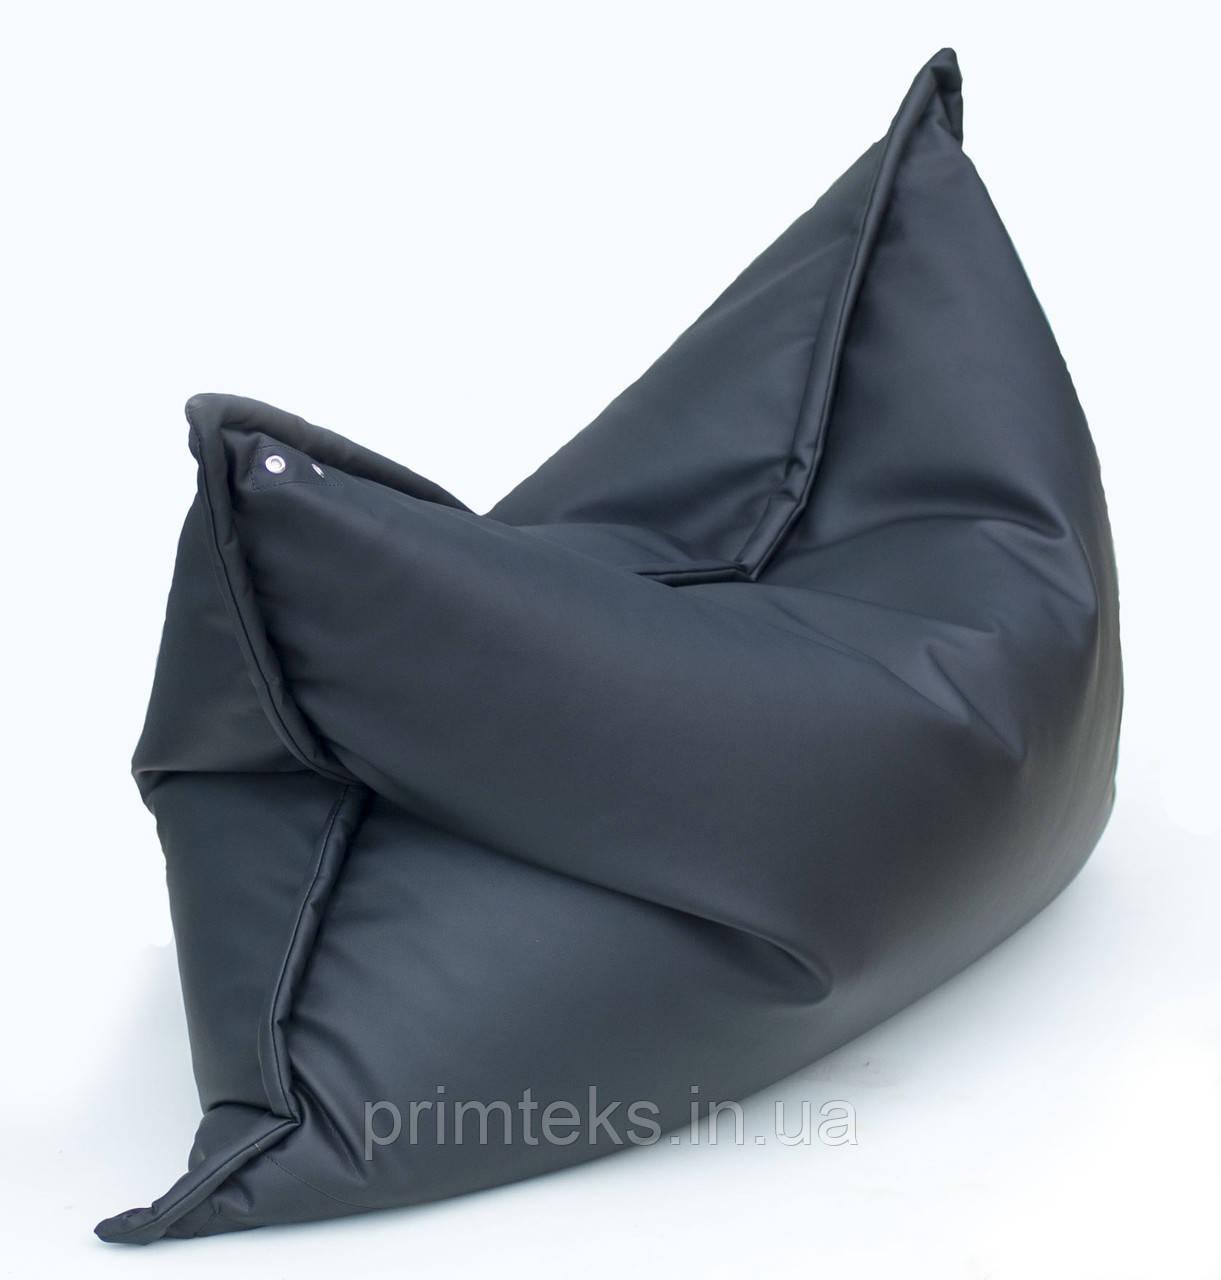 Кресло-Мат Guffy D-5 M Black